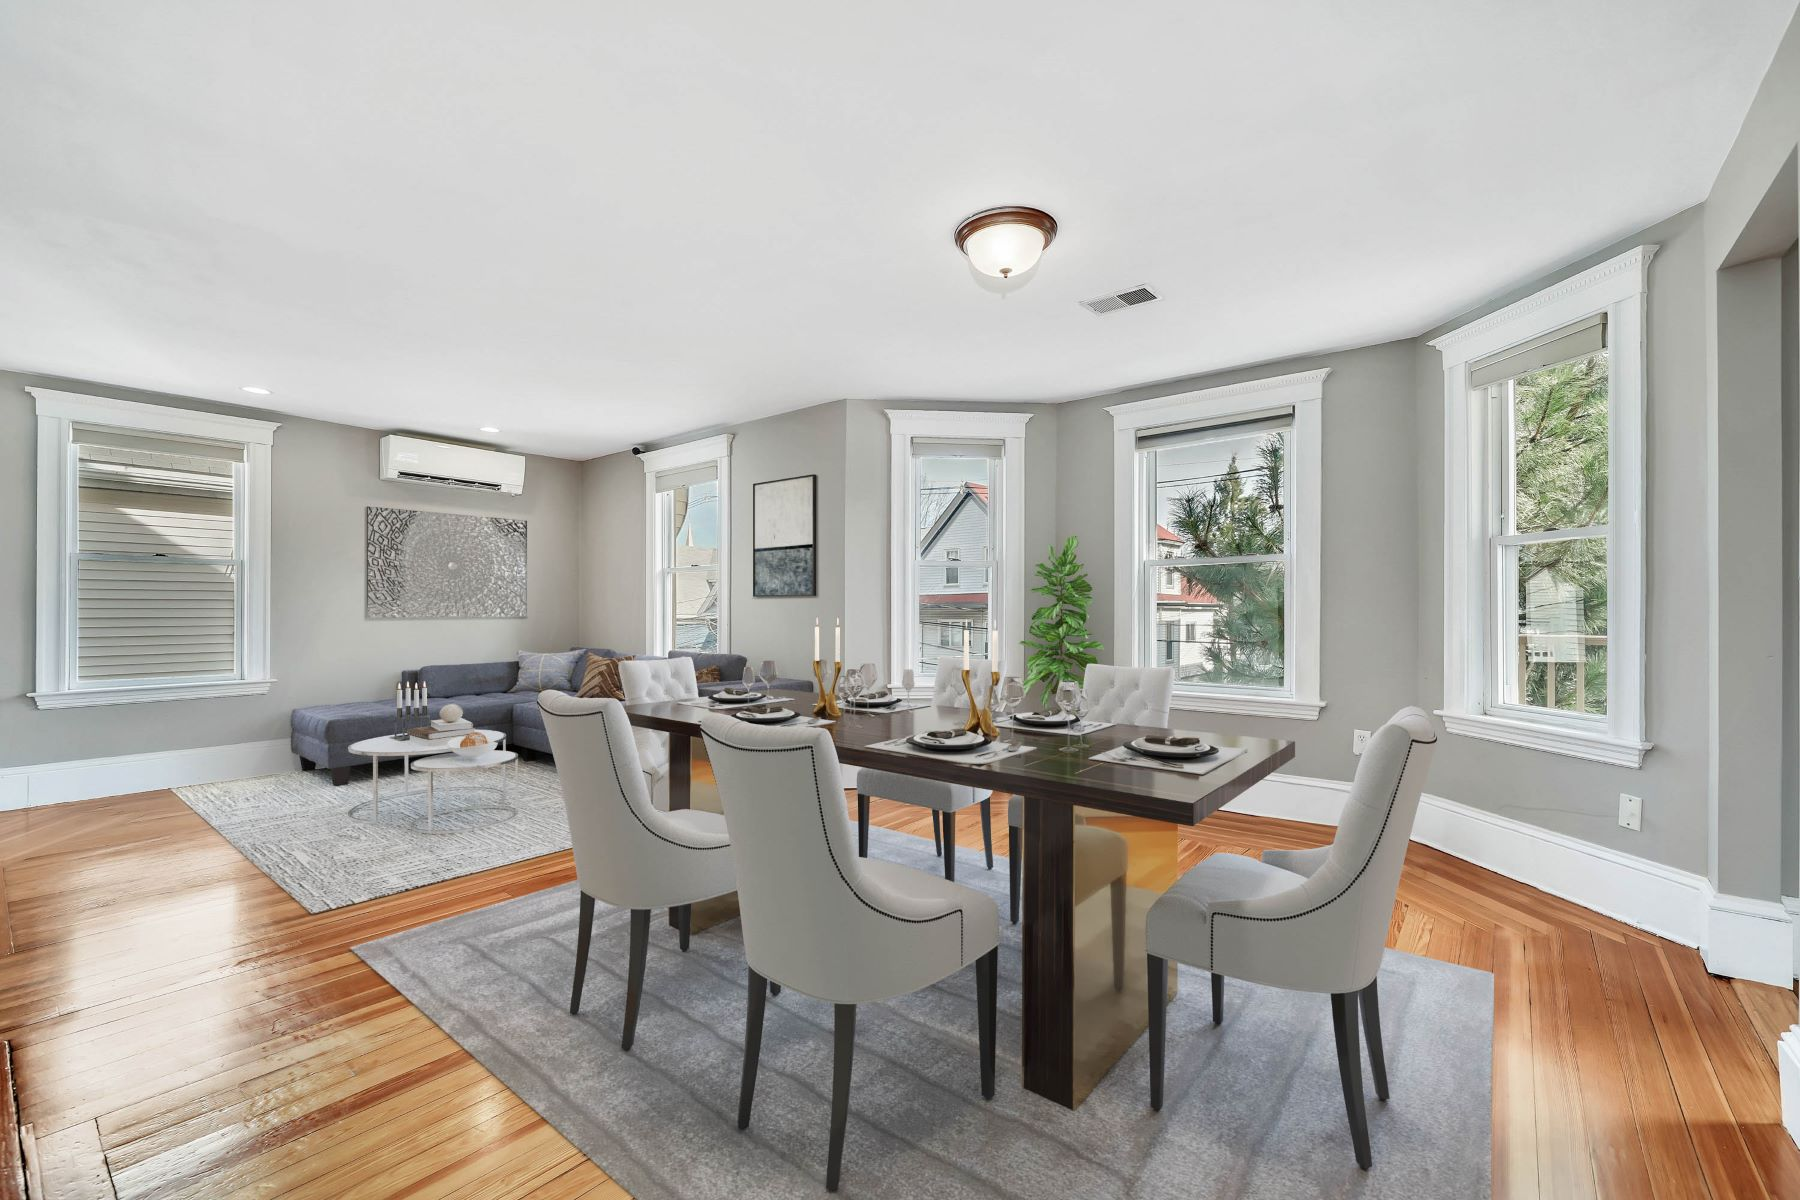 Duplex Homes 为 销售 在 20 Pearson Road - Unit B Somerville, 马萨诸塞州 02144 美国